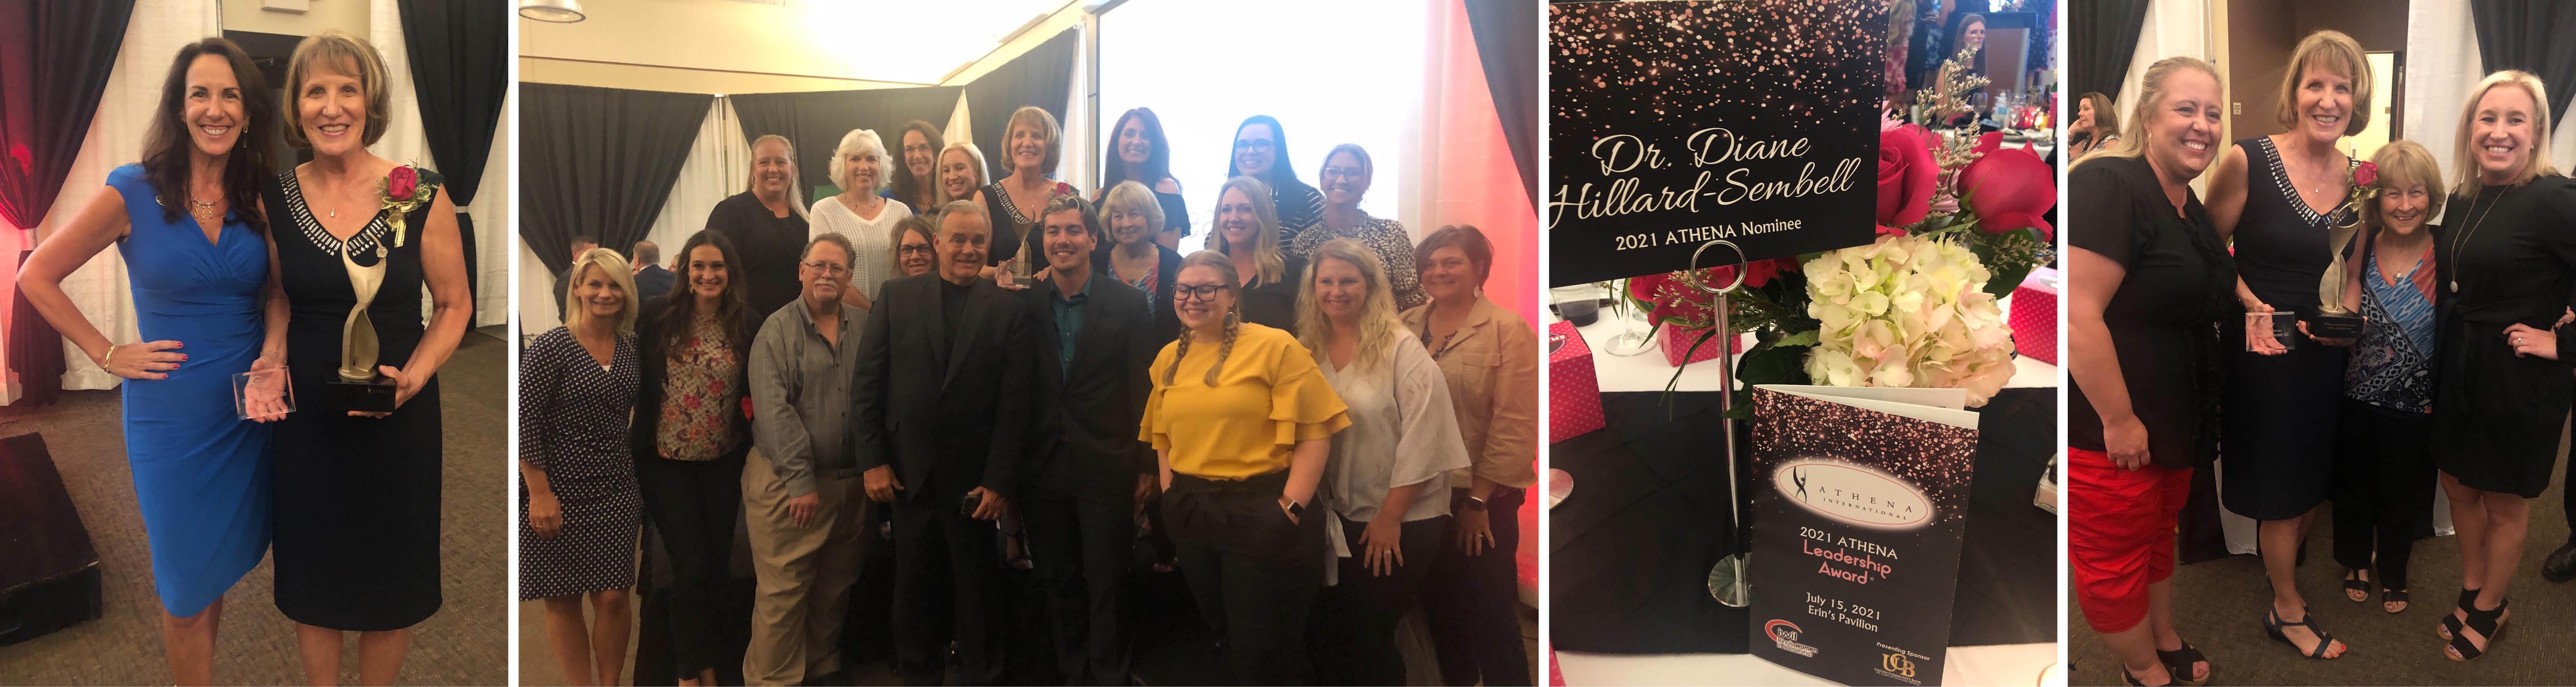 Photo gallery from Athena Award ceremony in Springfield, Illinois